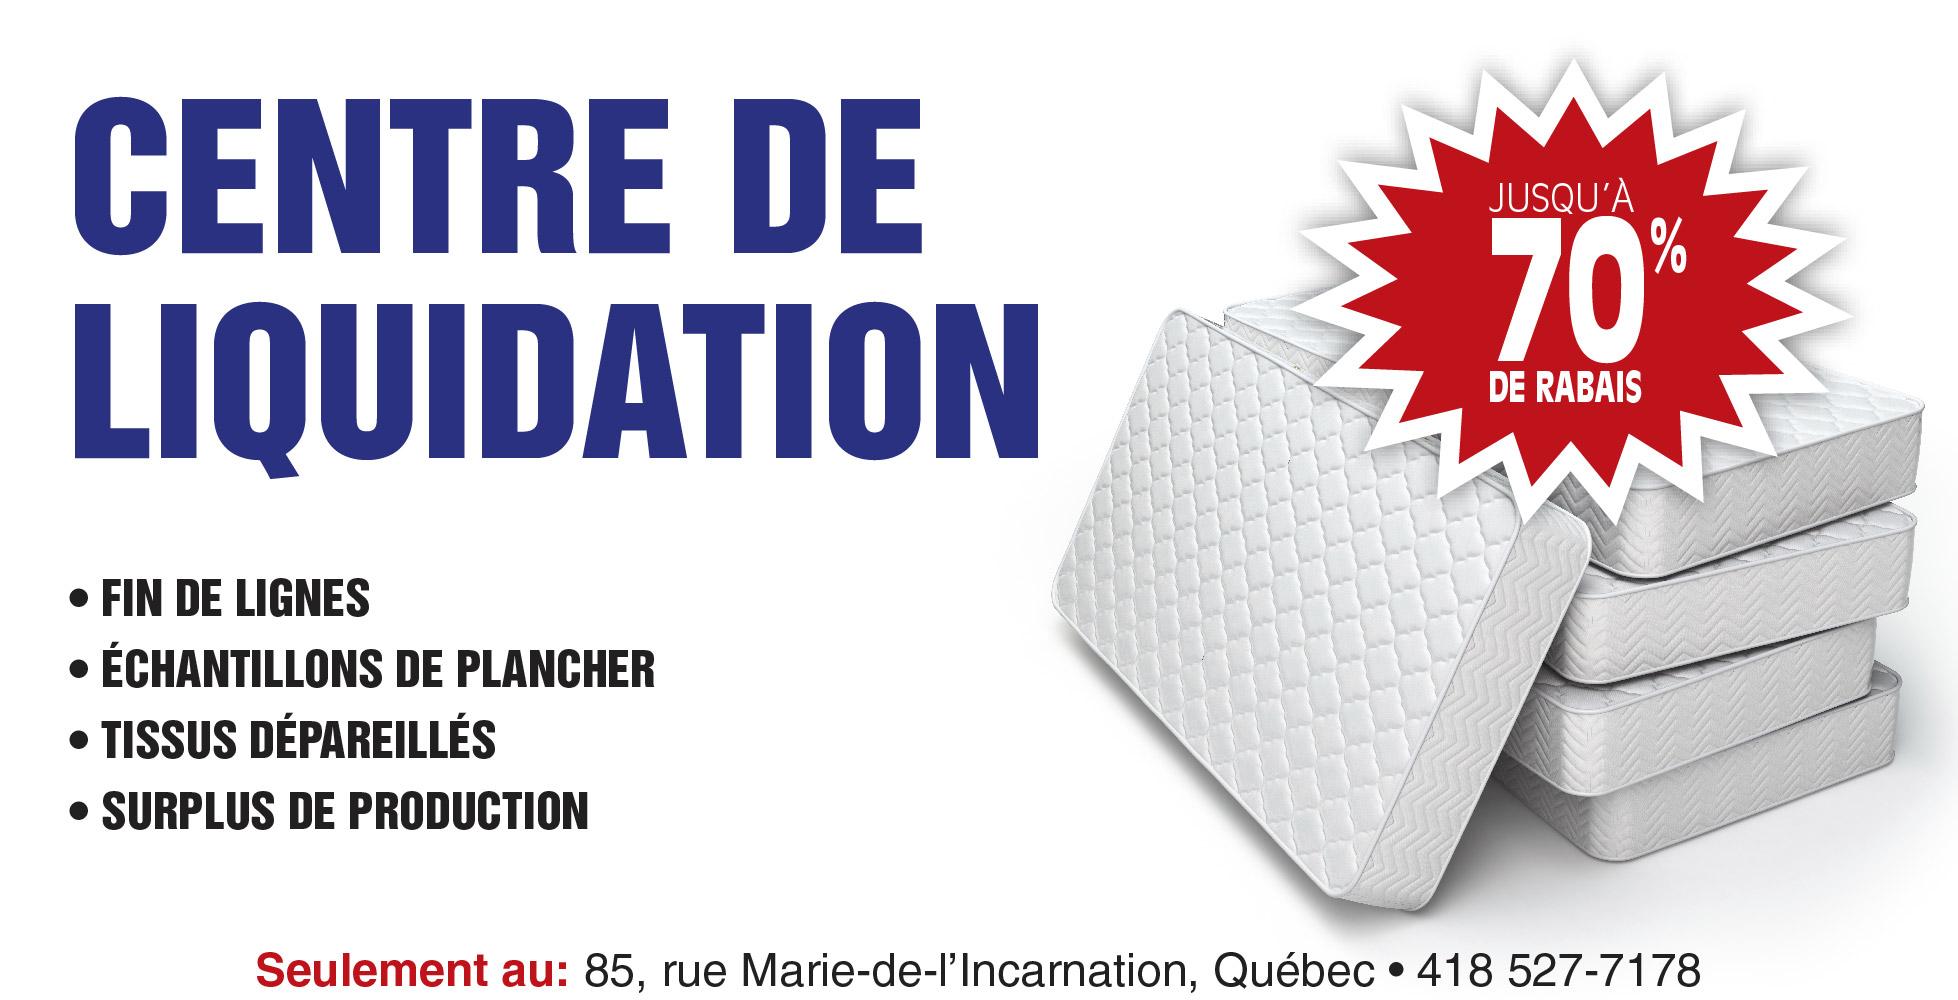 Centre de Liquidation